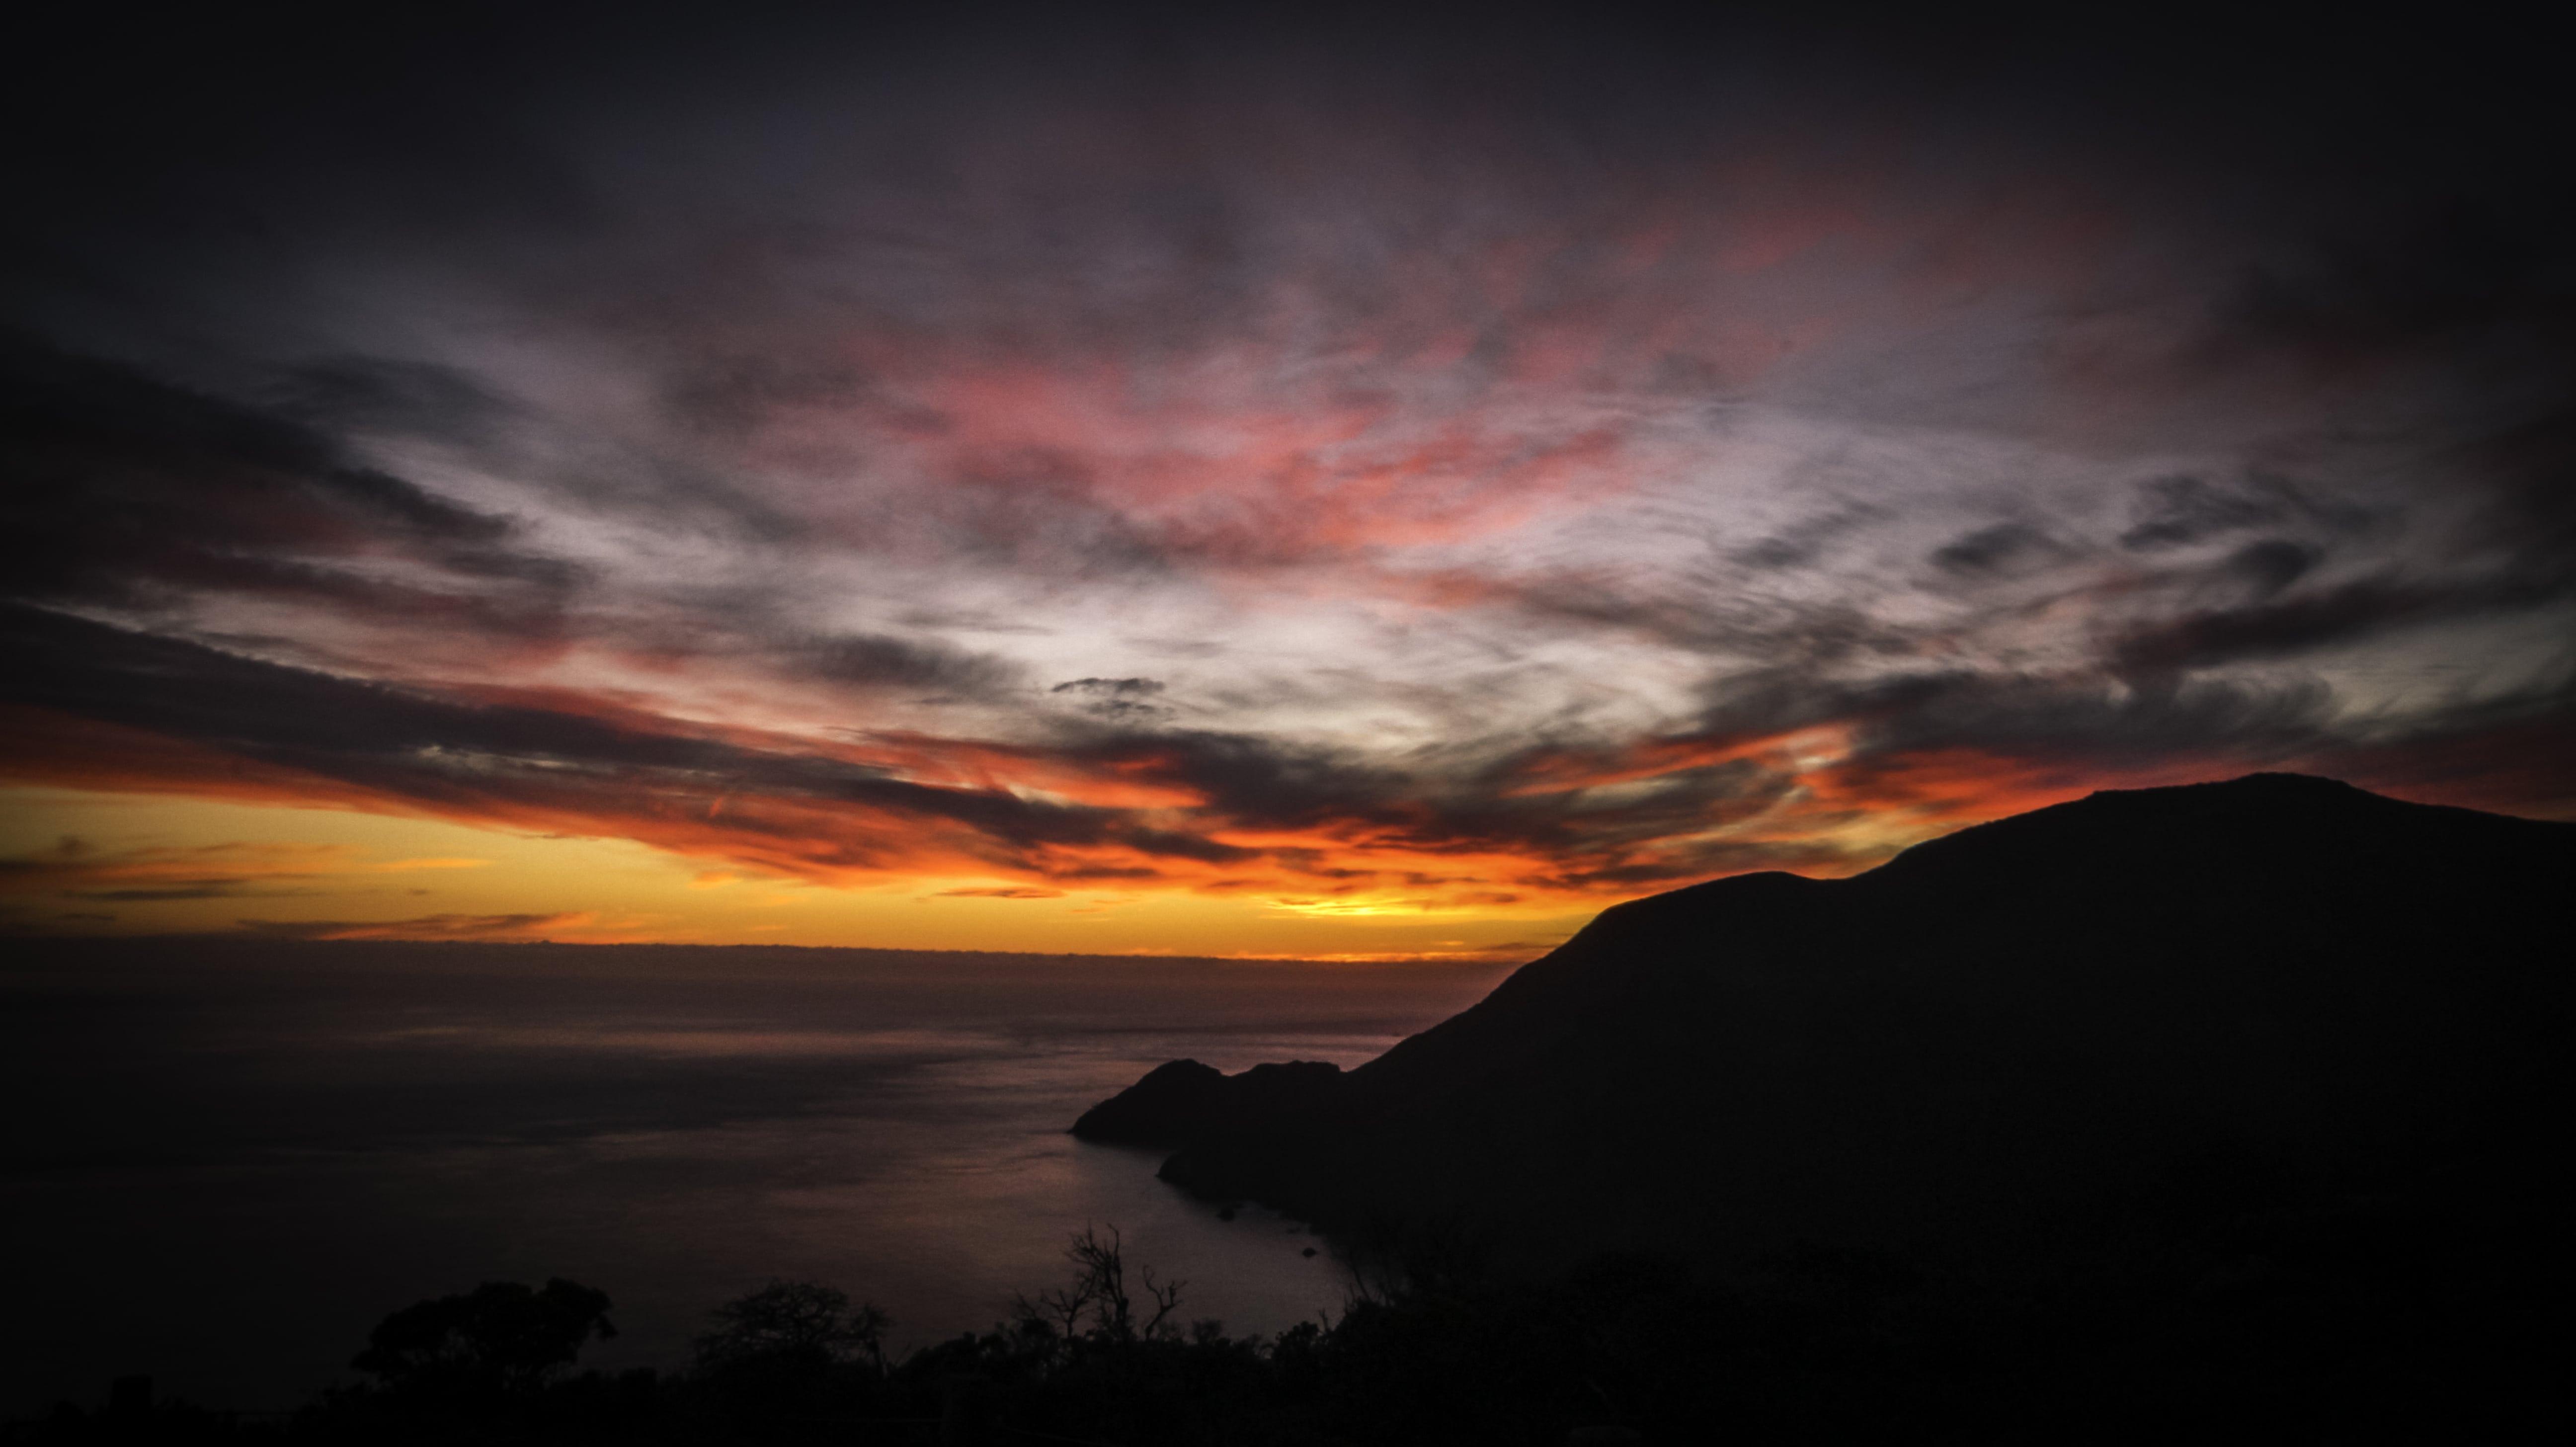 Twilight Clouds over Golden Gate Bridge